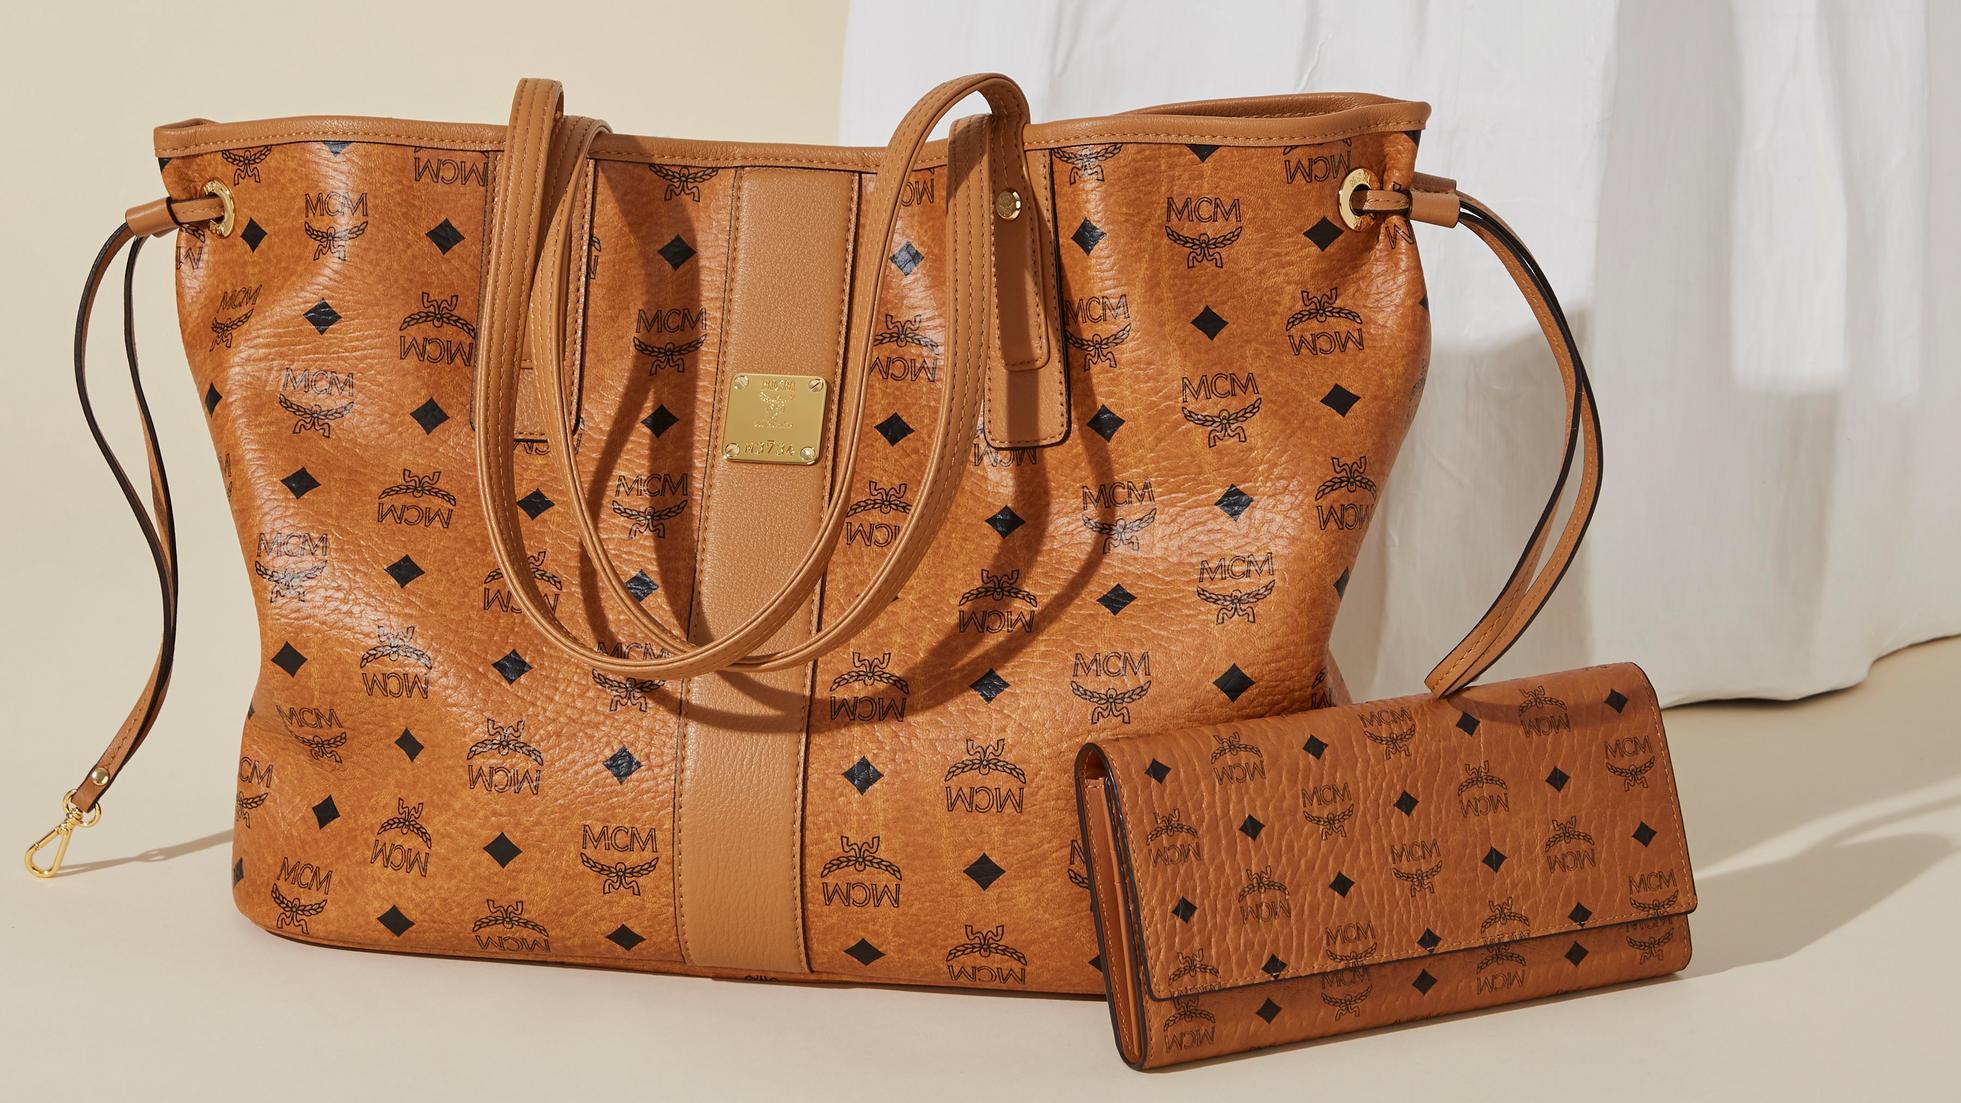 CATEGORY_03_WOMENS TOP HANDLE BAGS__013_Crop